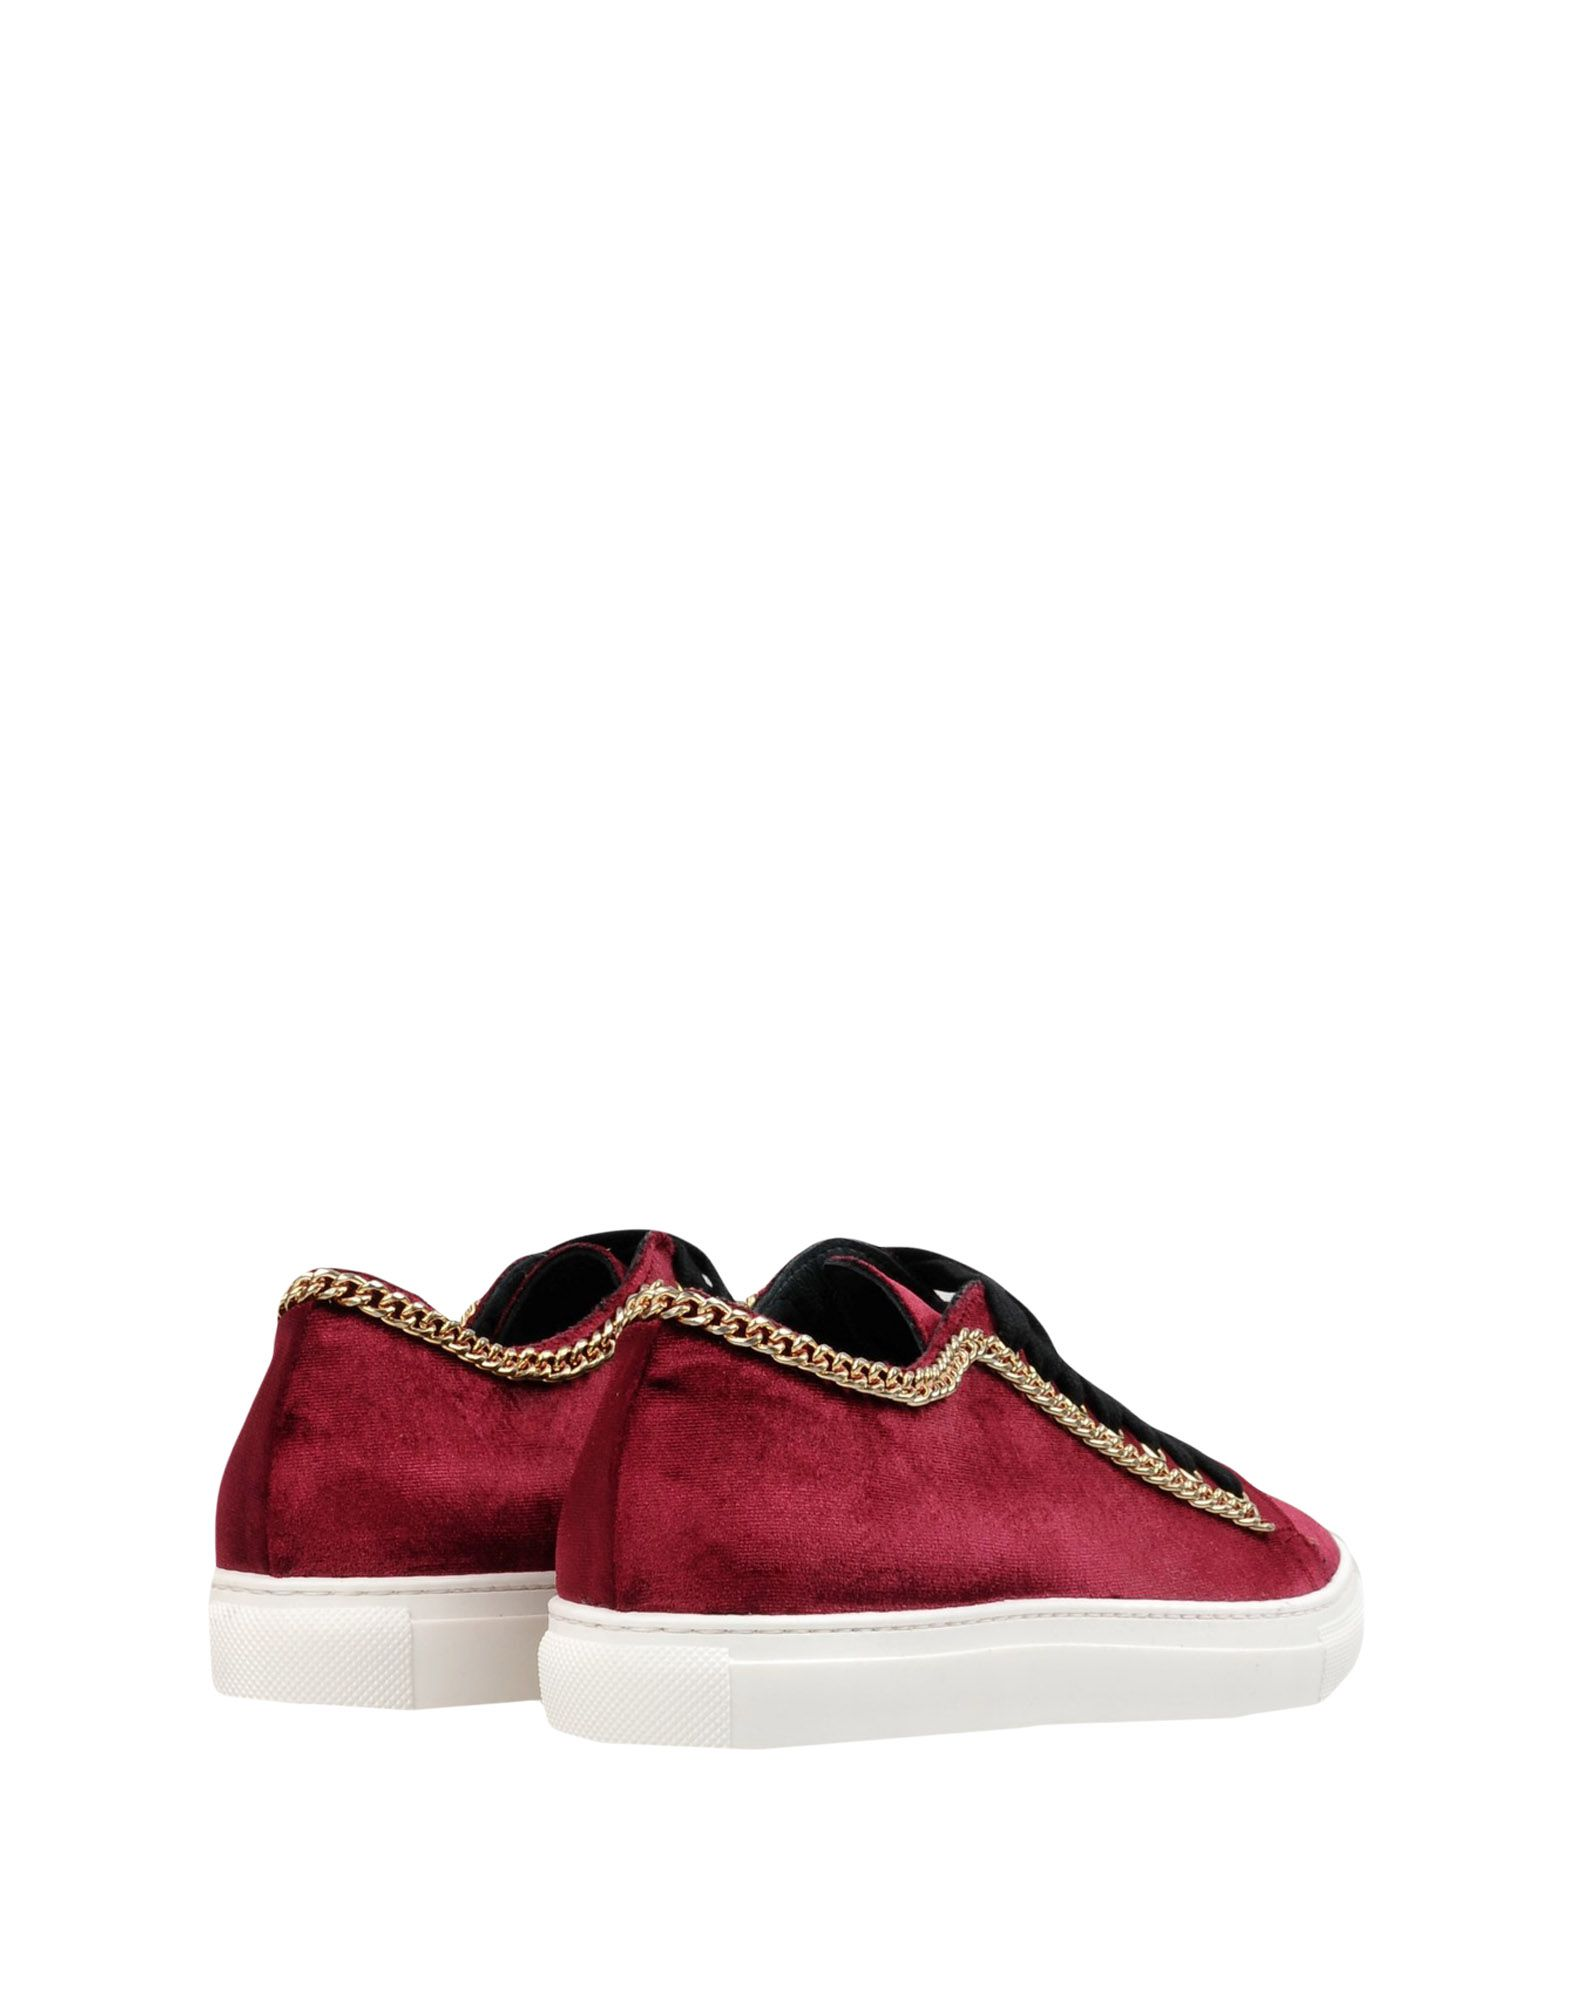 George J. Love Sneakers Gute Damen  11319475HA Gute Sneakers Qualität beliebte Schuhe 72c810